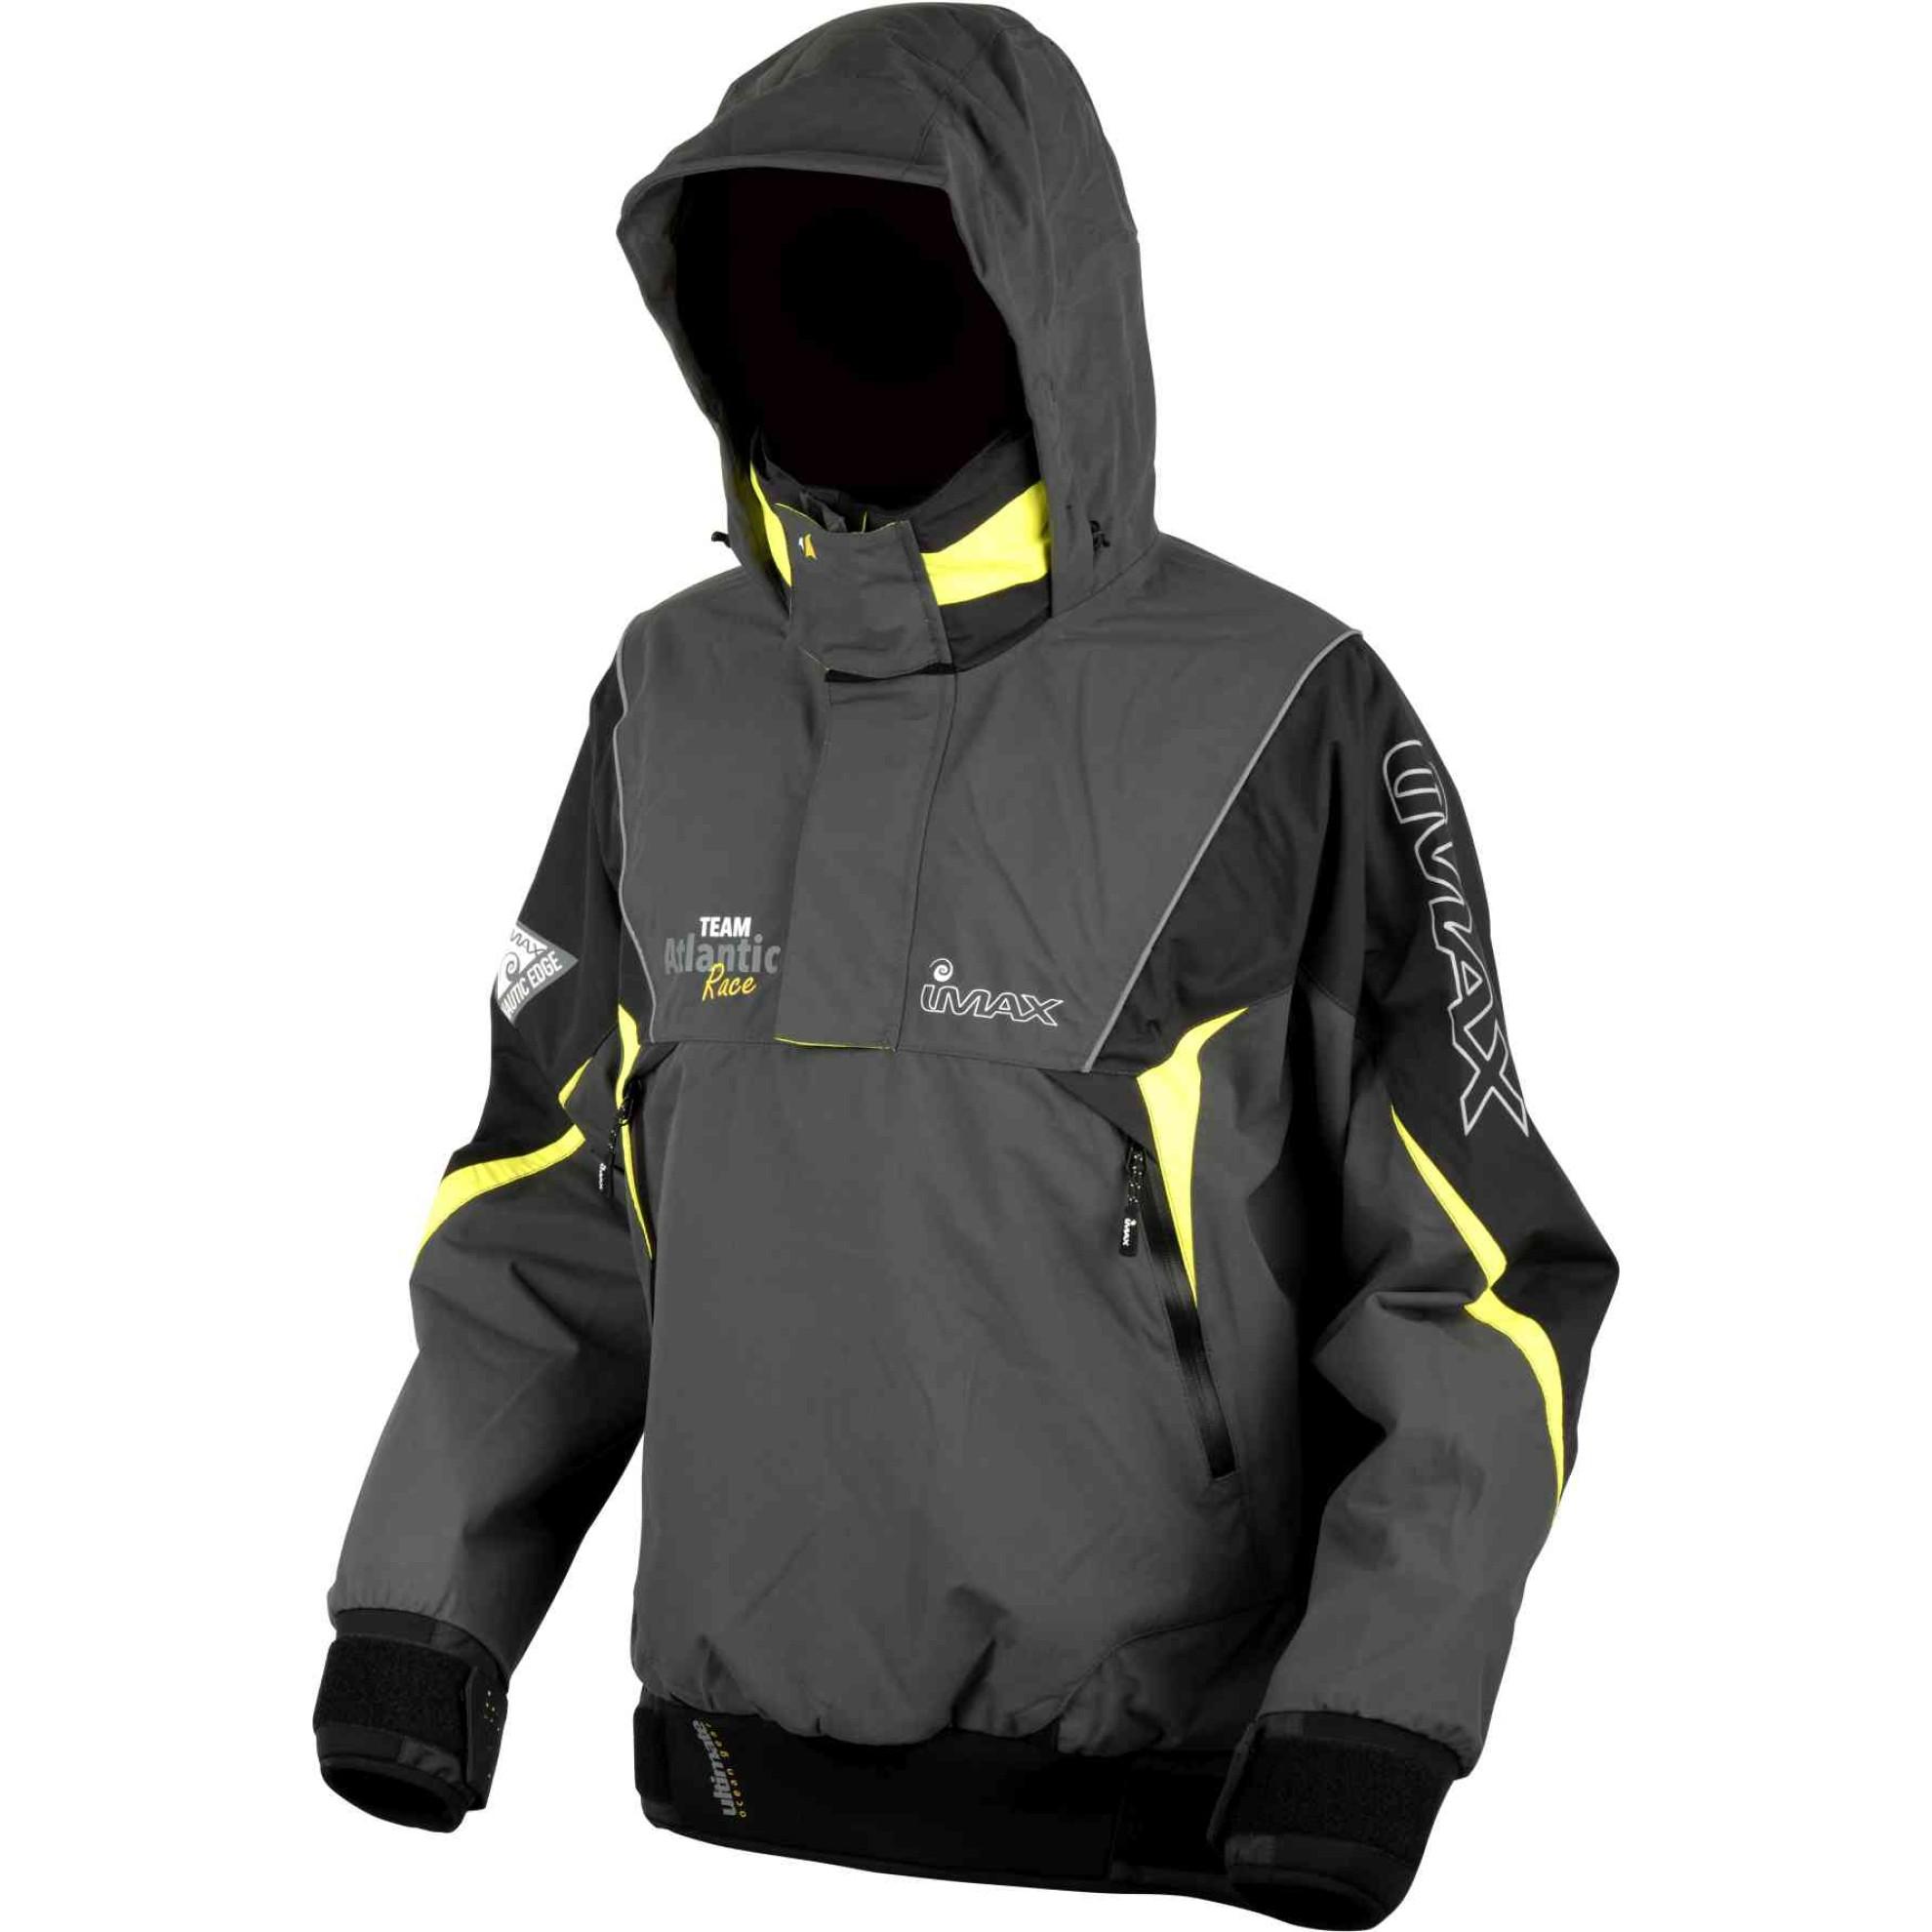 XXL Dark Grey Jacke Angeljacke Outdoor Savage Gear High Performance Jacket Gr Jacken & Mäntel Bekleidung